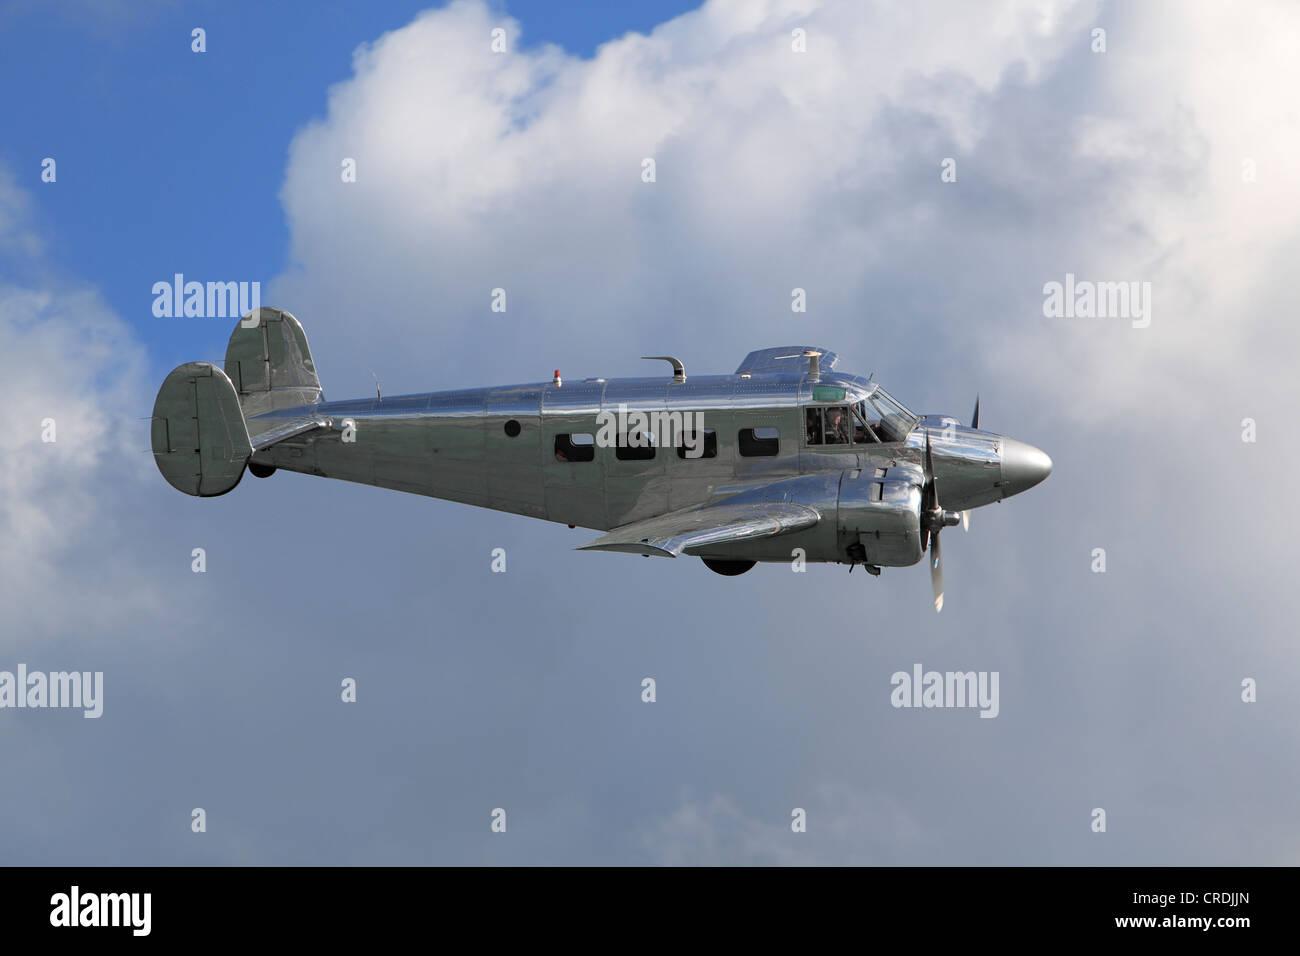 Beech Aircraft Corporation, Beechcraft 18, C-45 Expeditor, twin-engine light utility aircraft - Stock Image